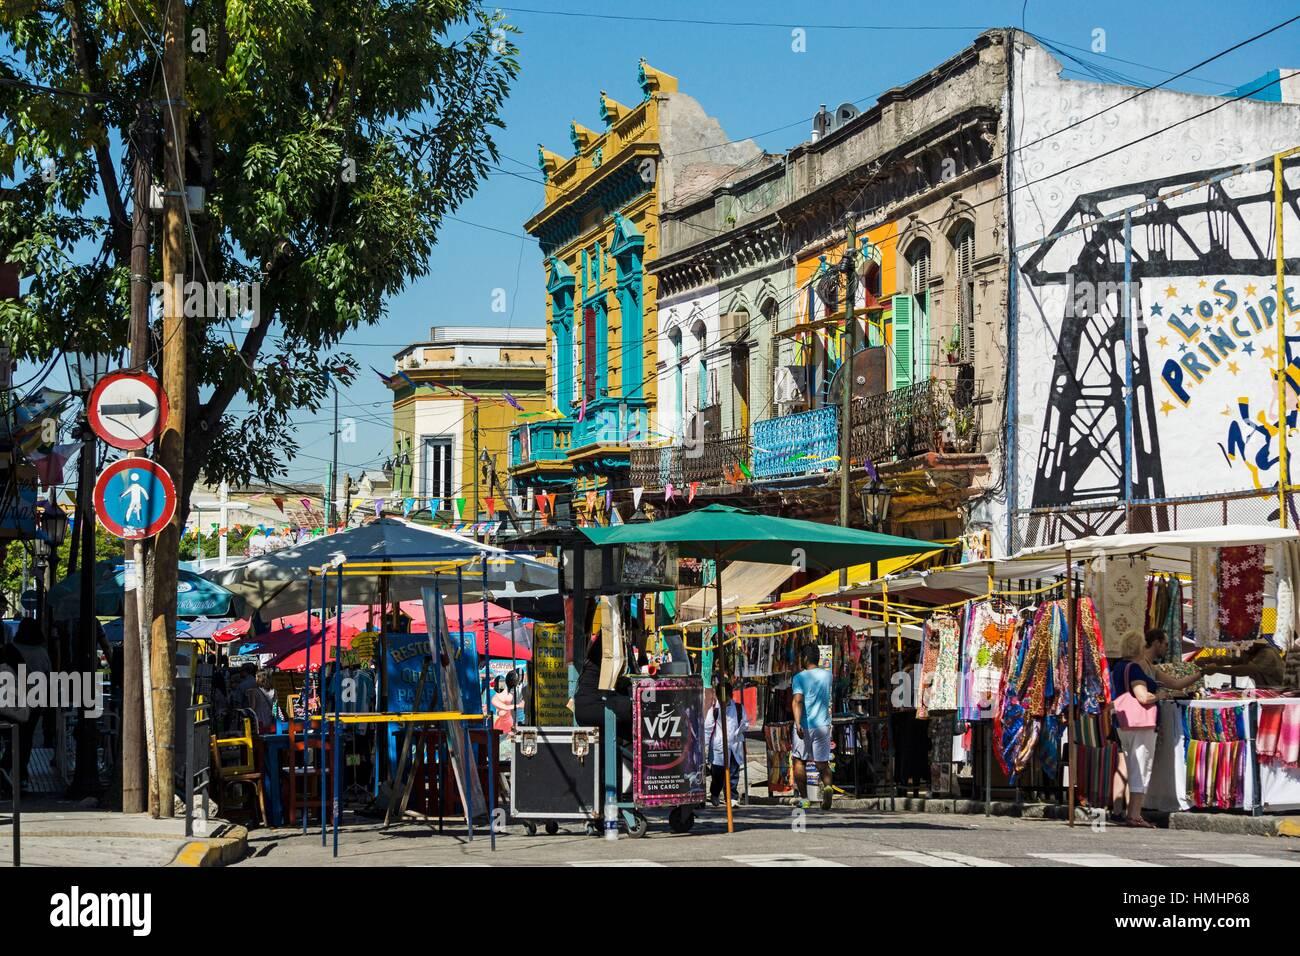 Caminito street, La Boca neighborhood, Buenos Aires, Argentina - Stock Image